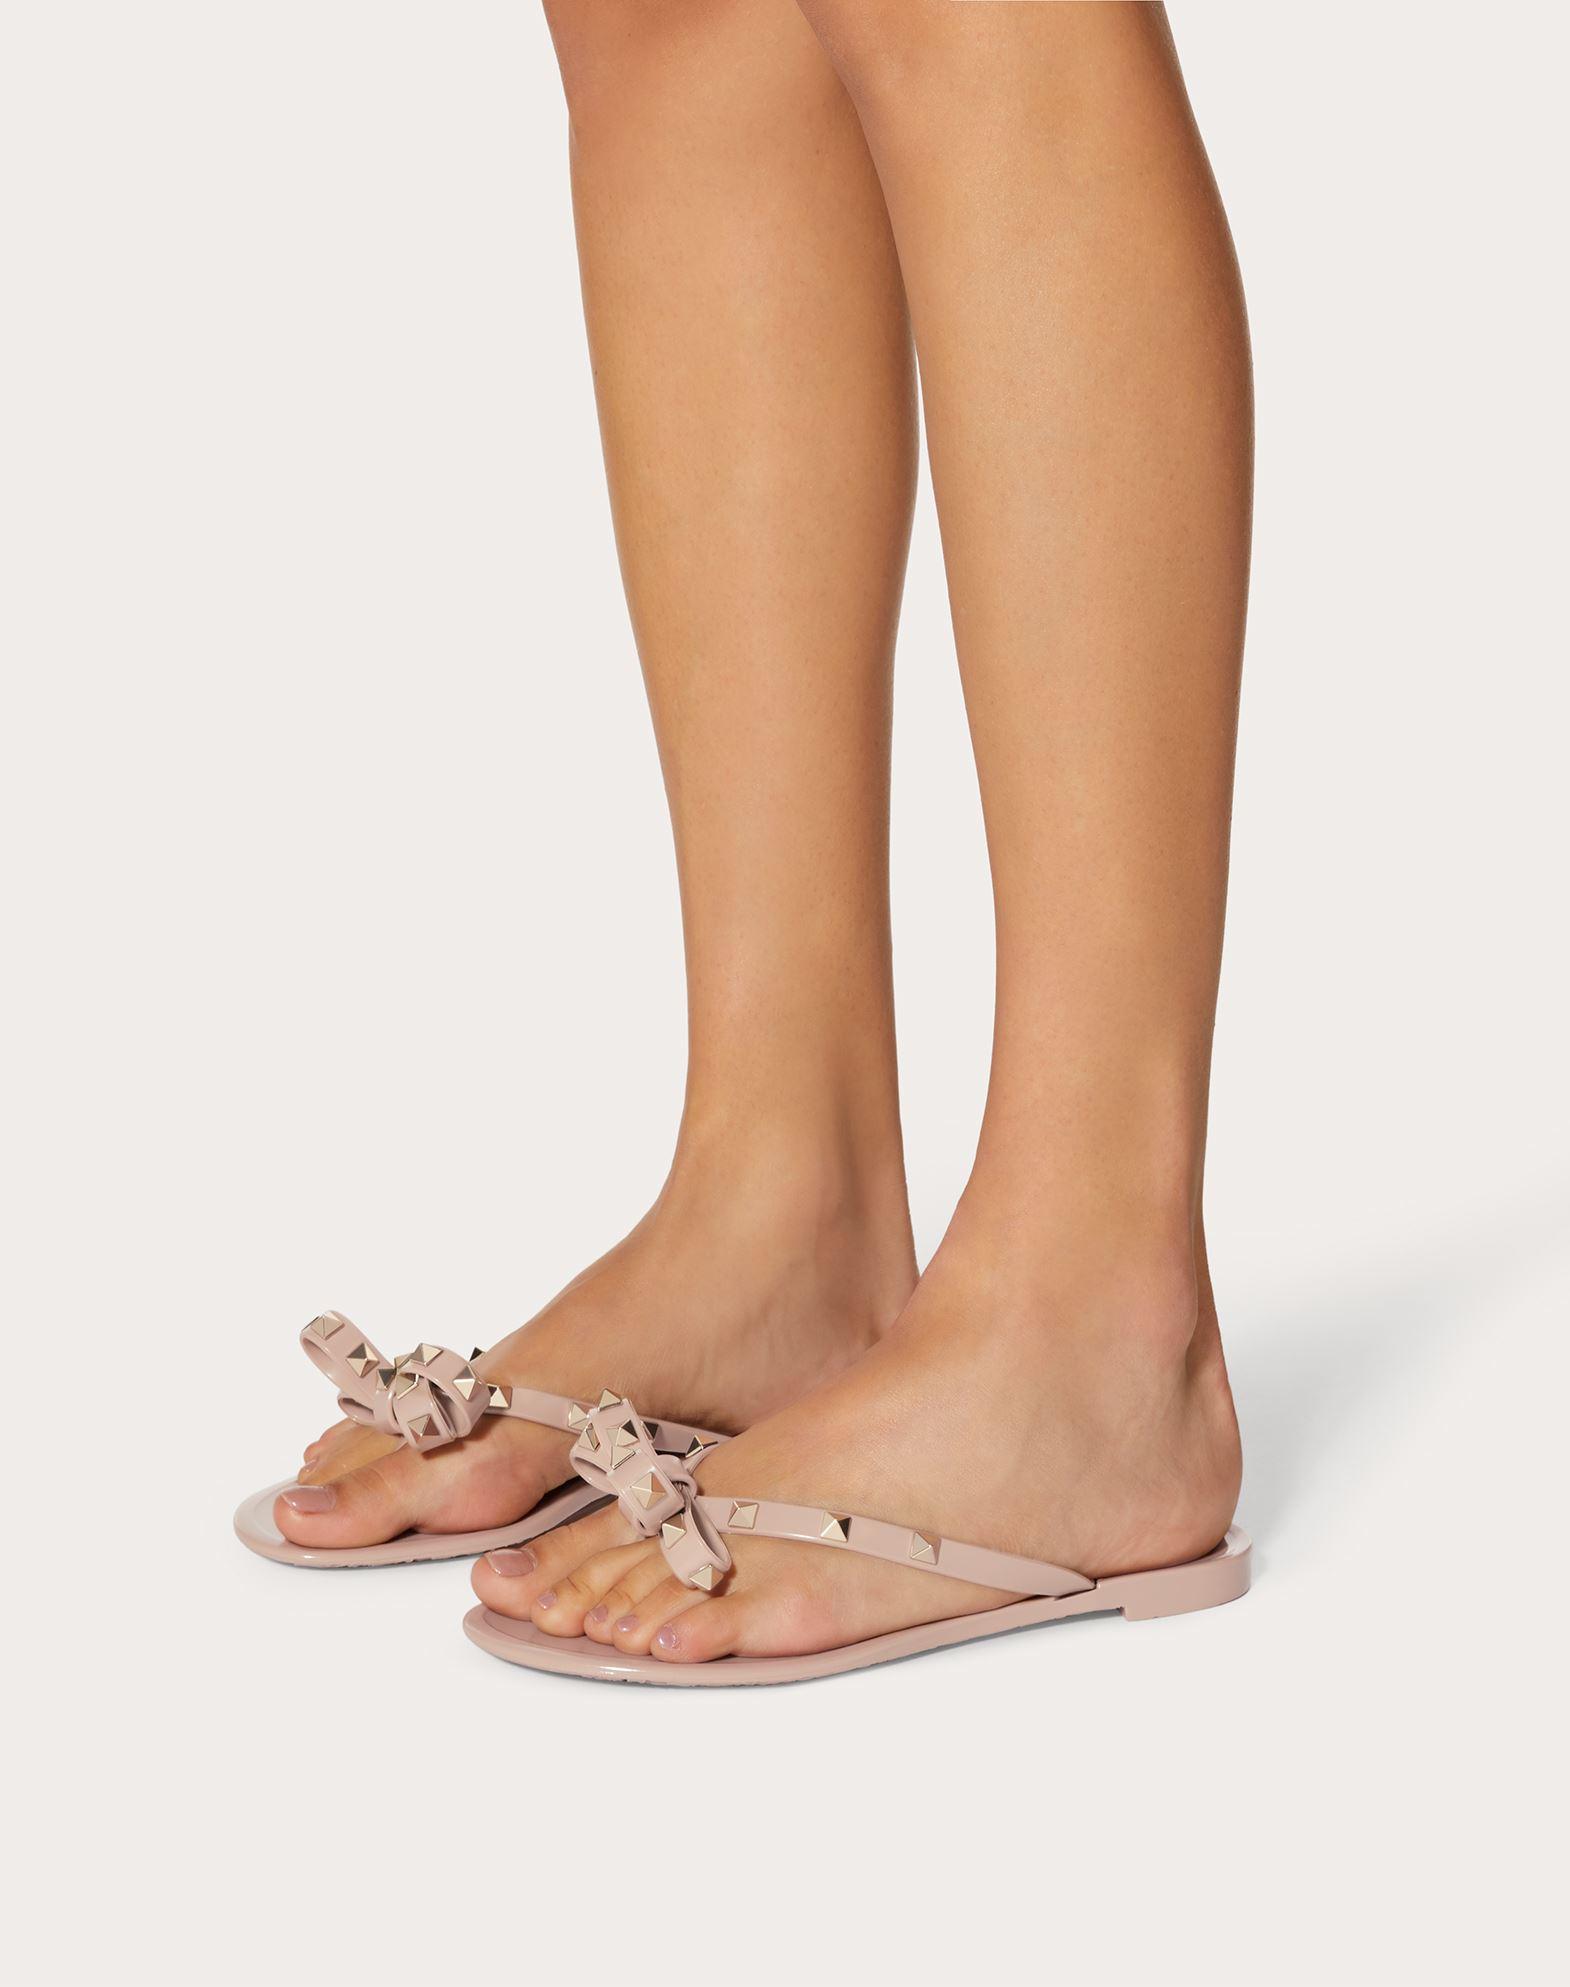 Valentino Sandals - Rockstud PVC Flip Flop Poudre - - Sandals for ladies Cheap Sale 100% Guaranteed Deals For Sale Shop For Cheap Price Fake Sale Online sJAbF41